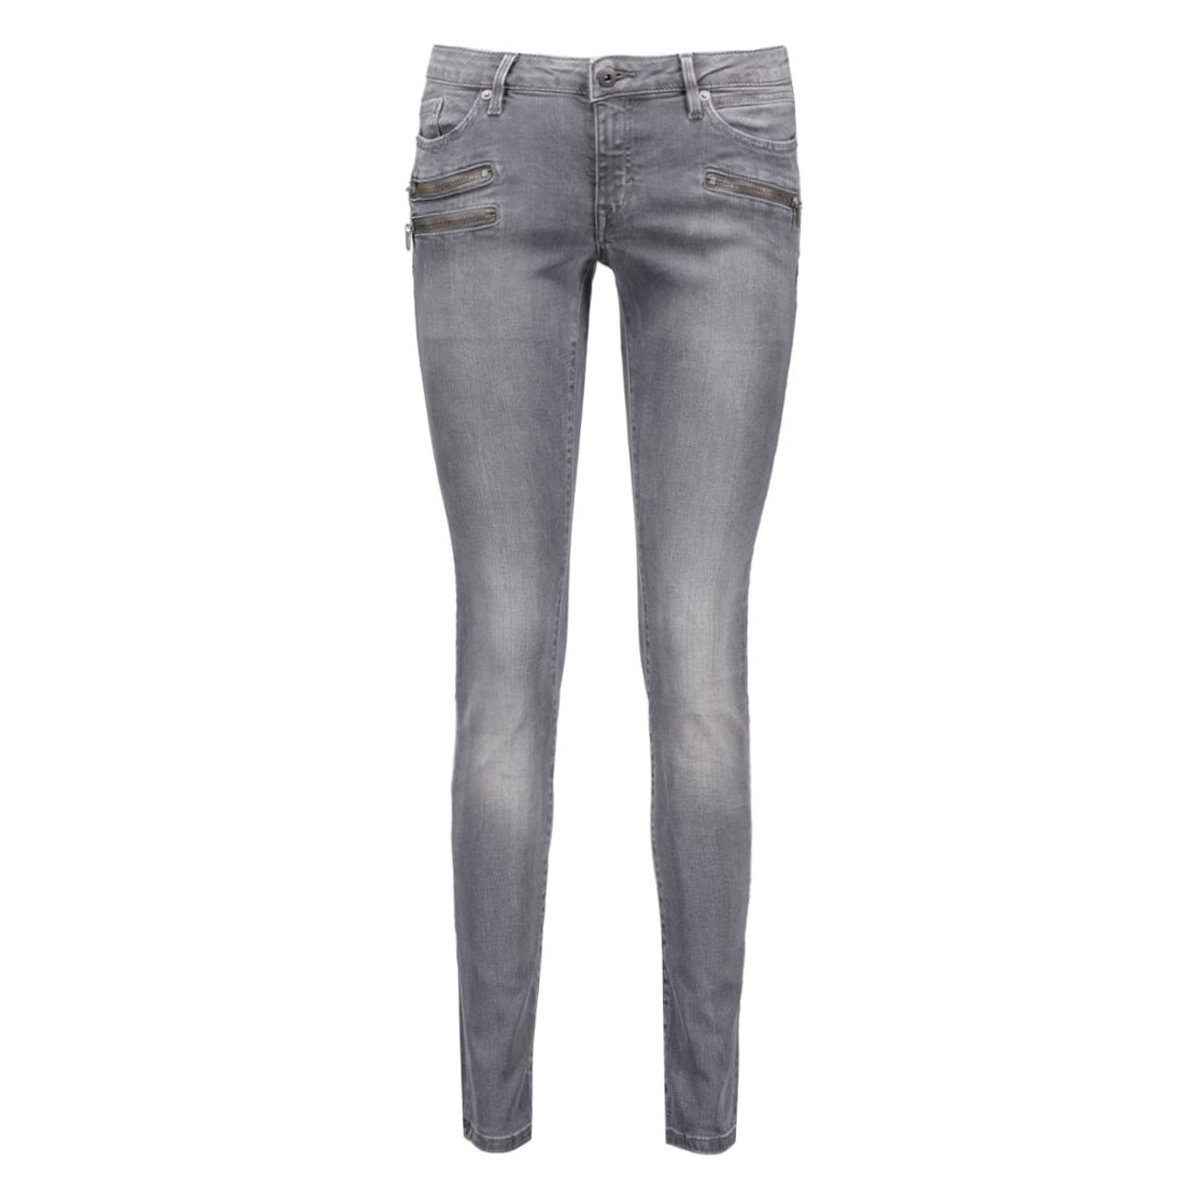 096cc1b032 edc jeans c922